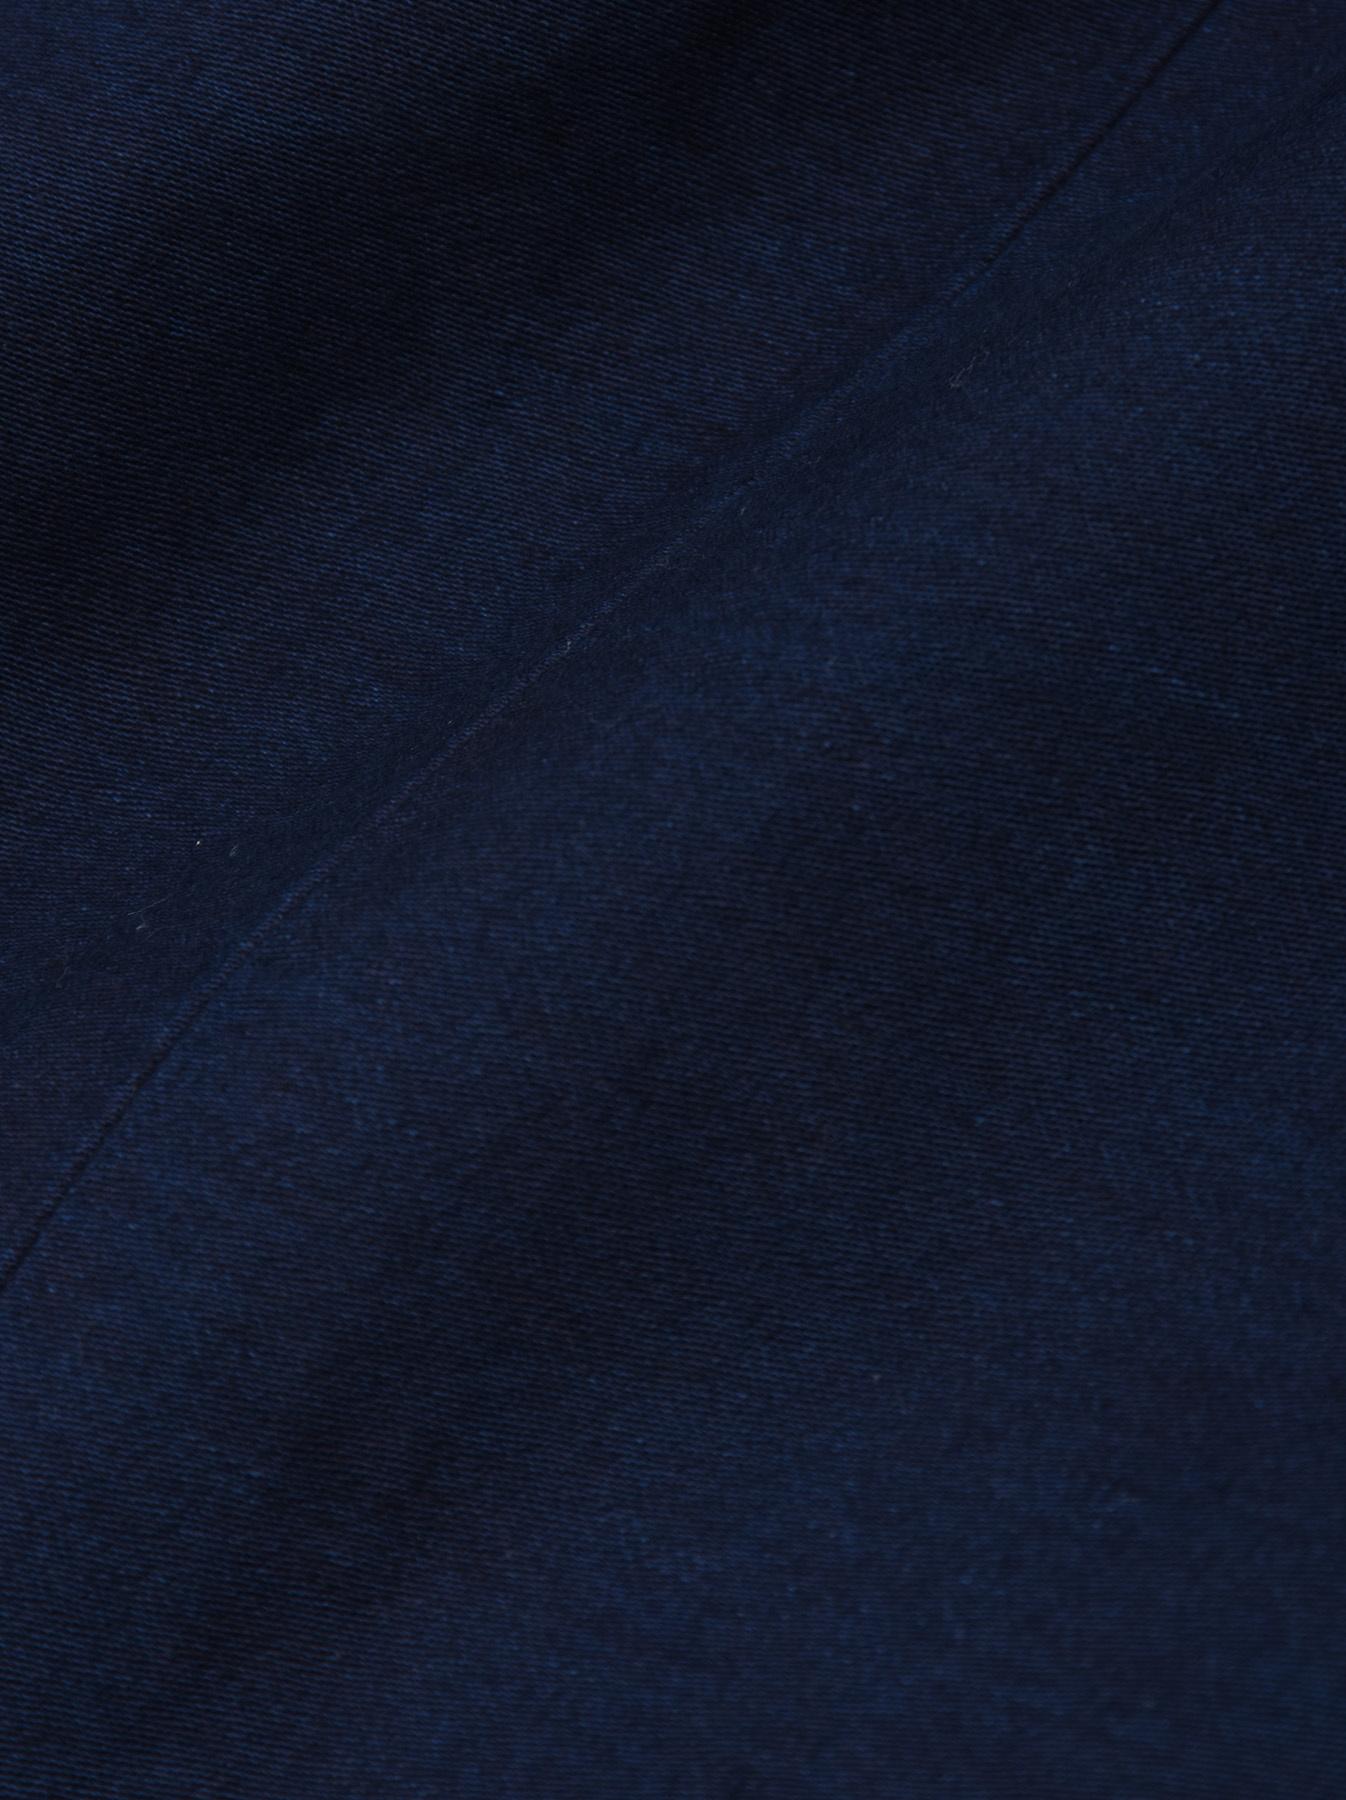 Indigo Mugi Yoko-shusi Soroe Double Breasted Jacket-12